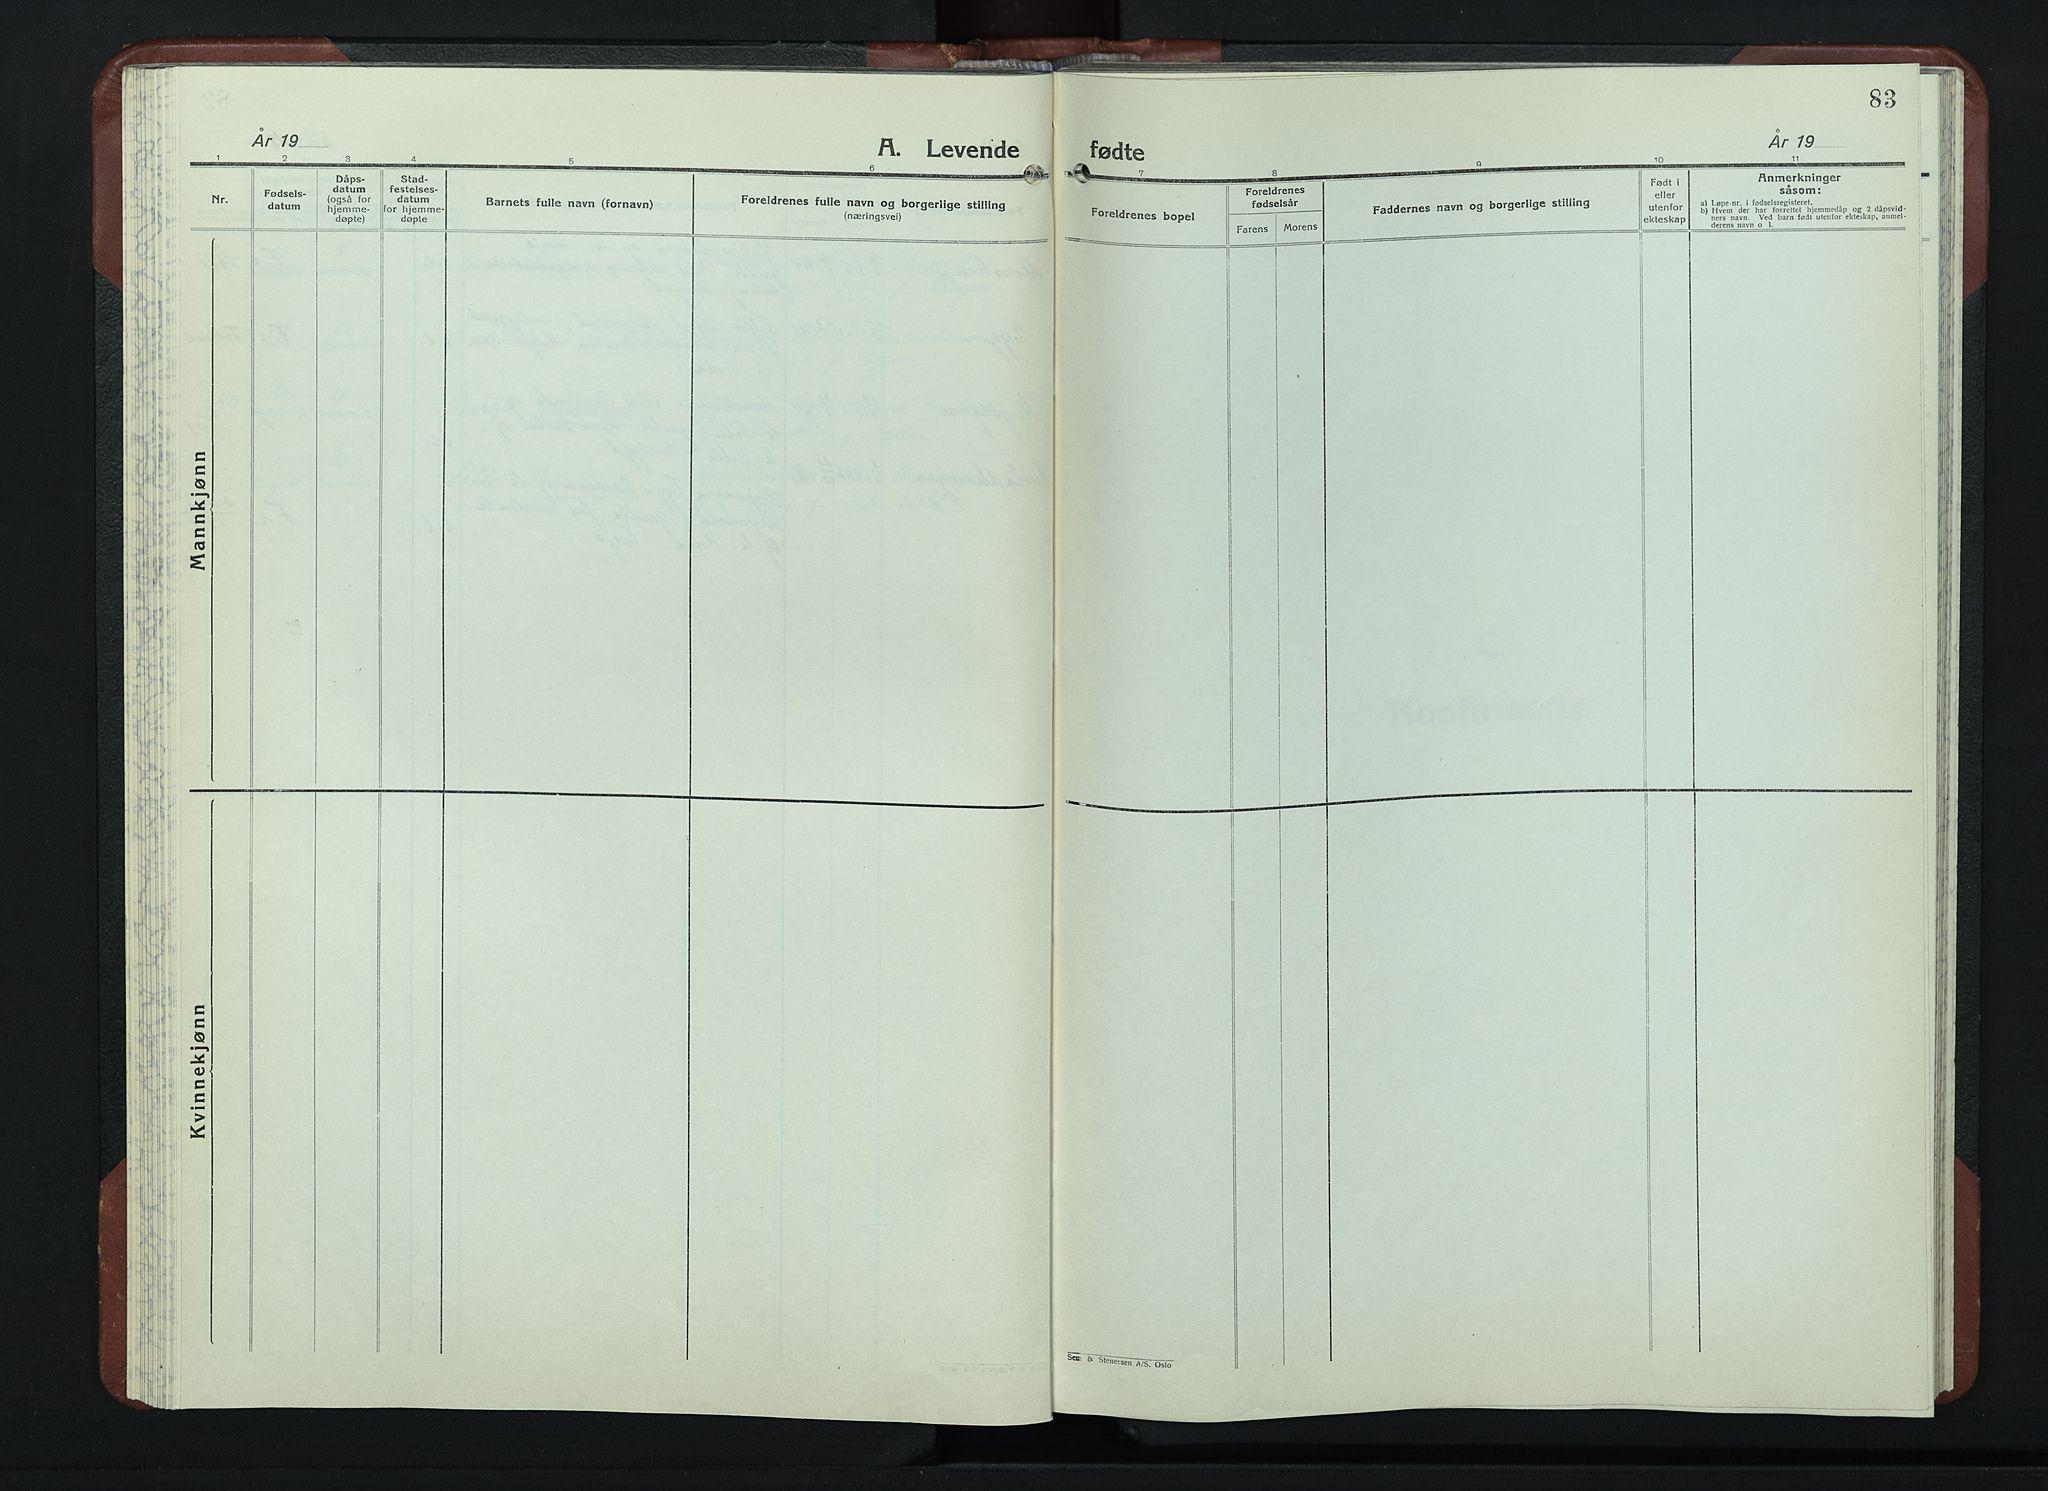 SAH, Sør-Fron prestekontor, H/Ha/Hab/L0006: Klokkerbok nr. 6, 1933-1948, s. 83